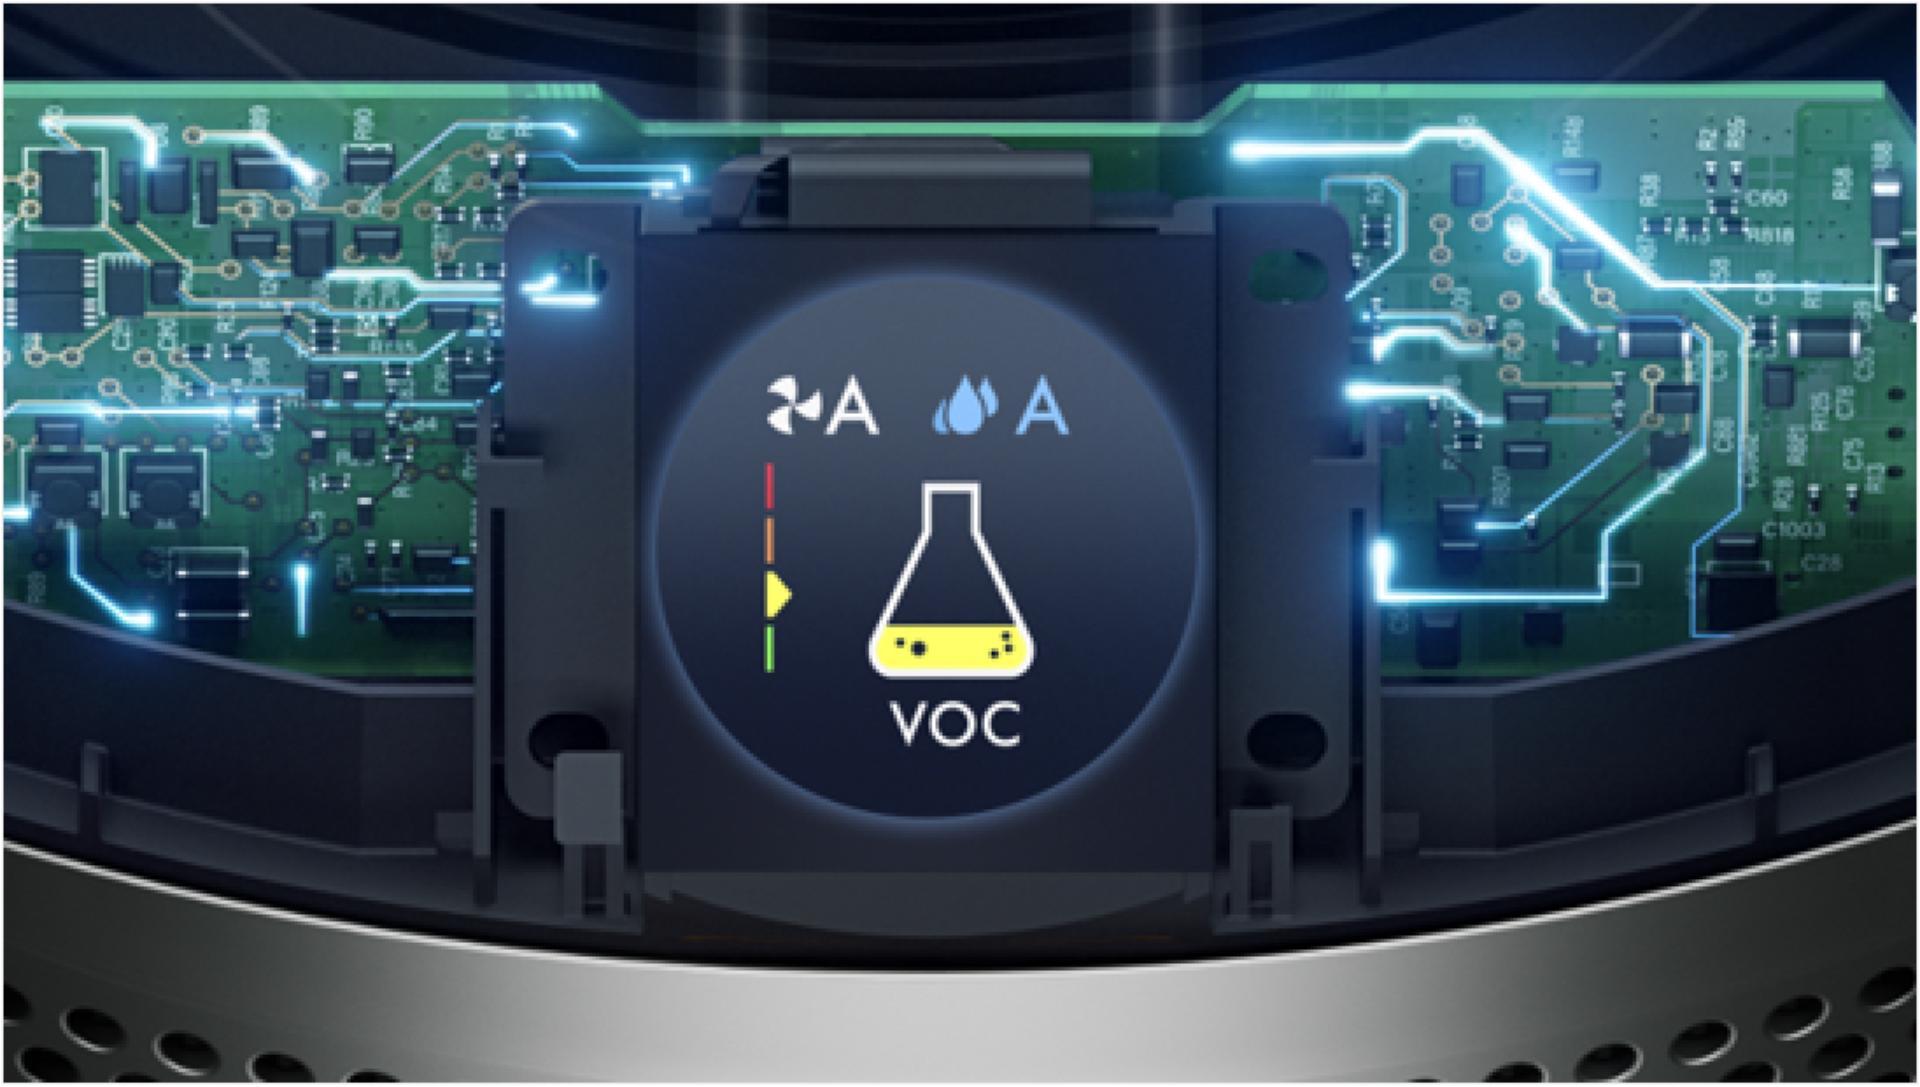 Zbliżenie na ekran LCD